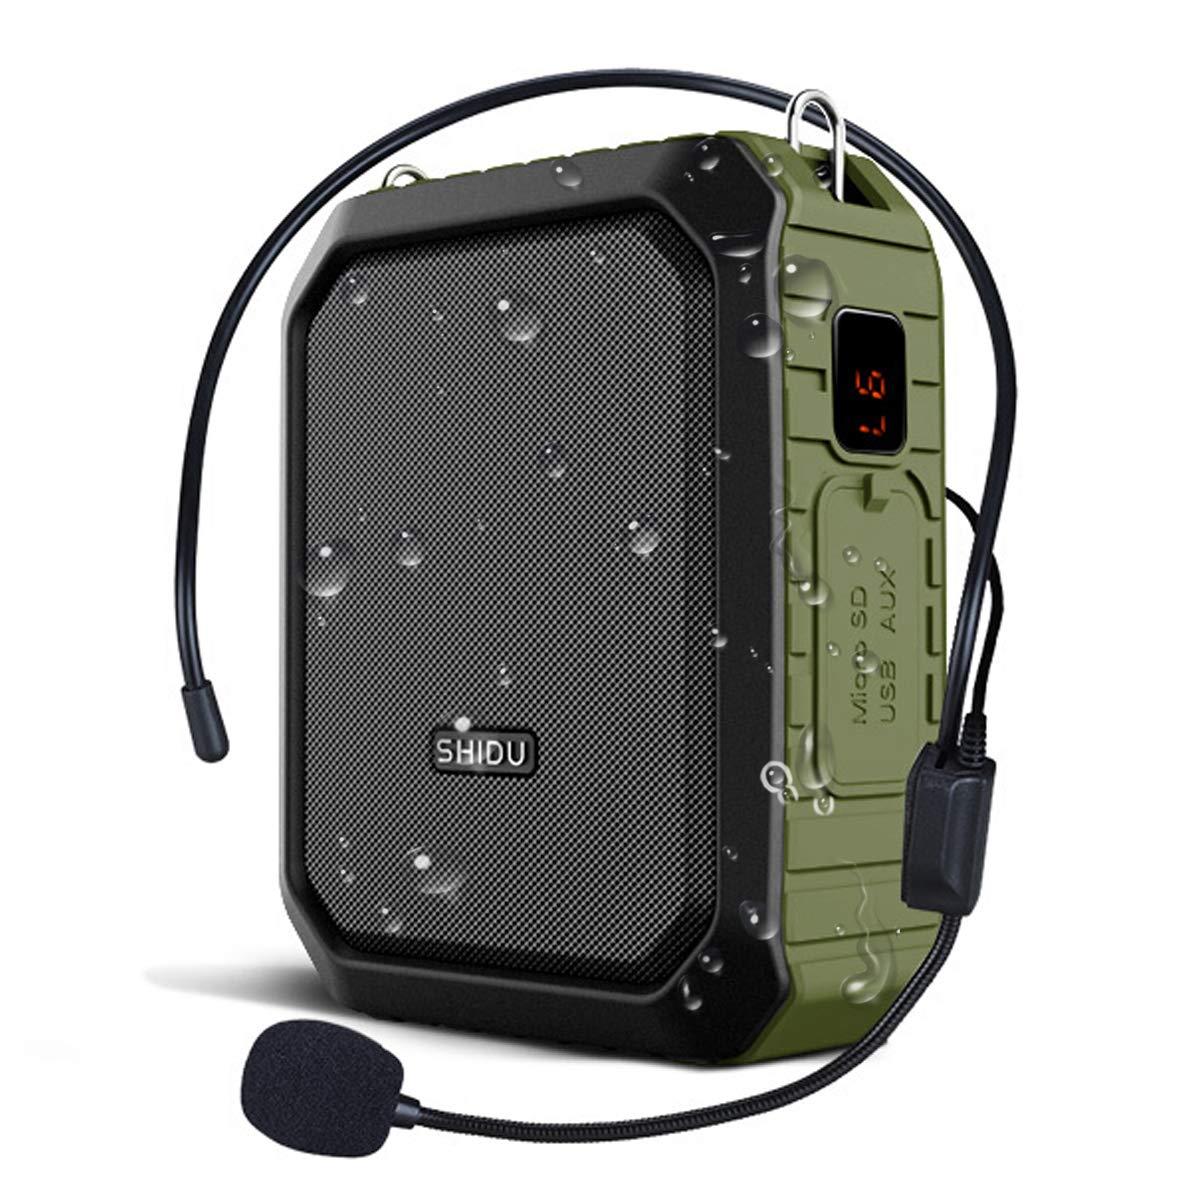 Updated WinBridge Voice Amplifier Microphone Headset Wired Loudspeaker Voice Changer Megaphone Portable Microphone Mini Amp Pa System for Teachers Parkinsons Outdoors Waterproof 18W by W WINBRIDGE